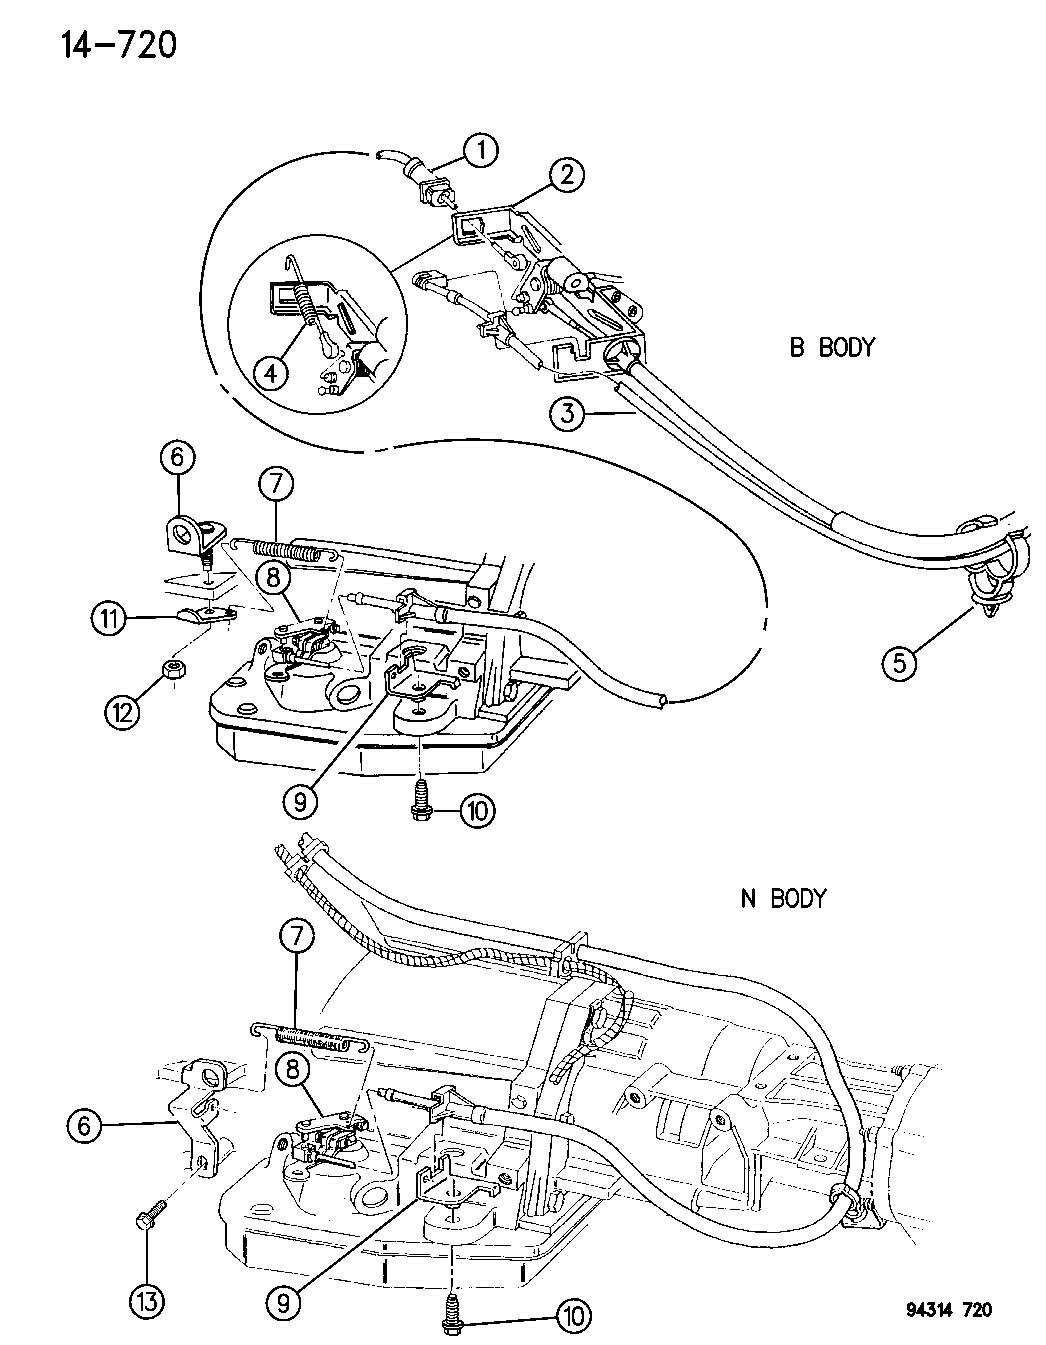 Dodge Dakota 5 2l V8 Mpi 4 Spd Automatic 46rh Throttle